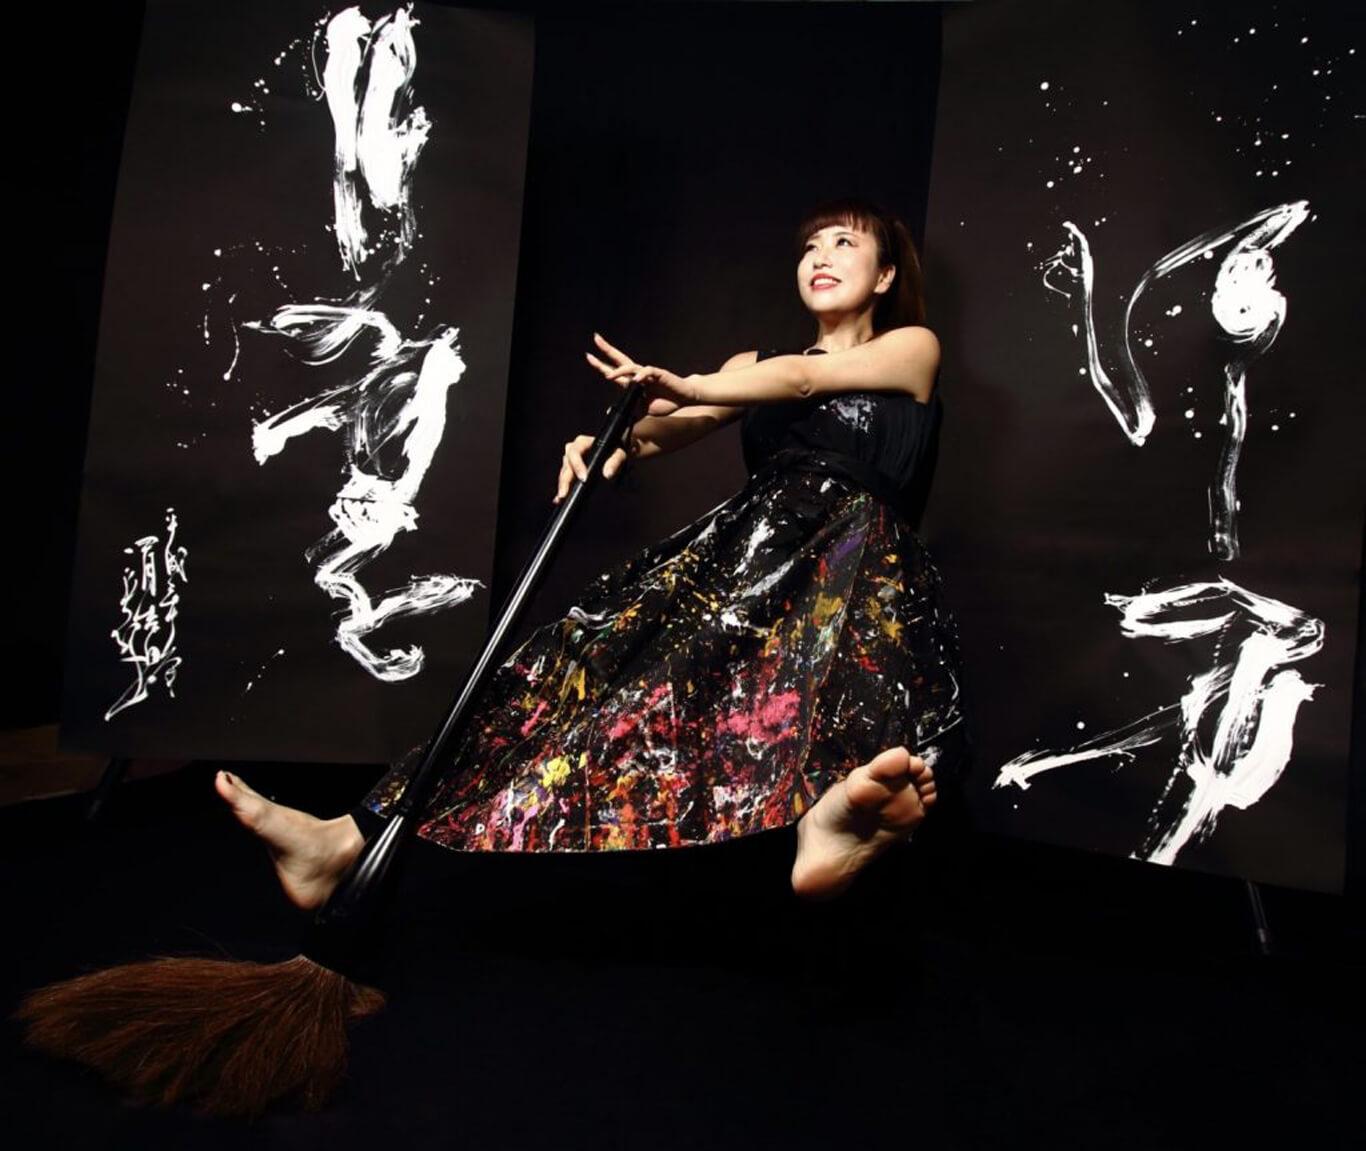 g4830-201908-中島美紀-個展